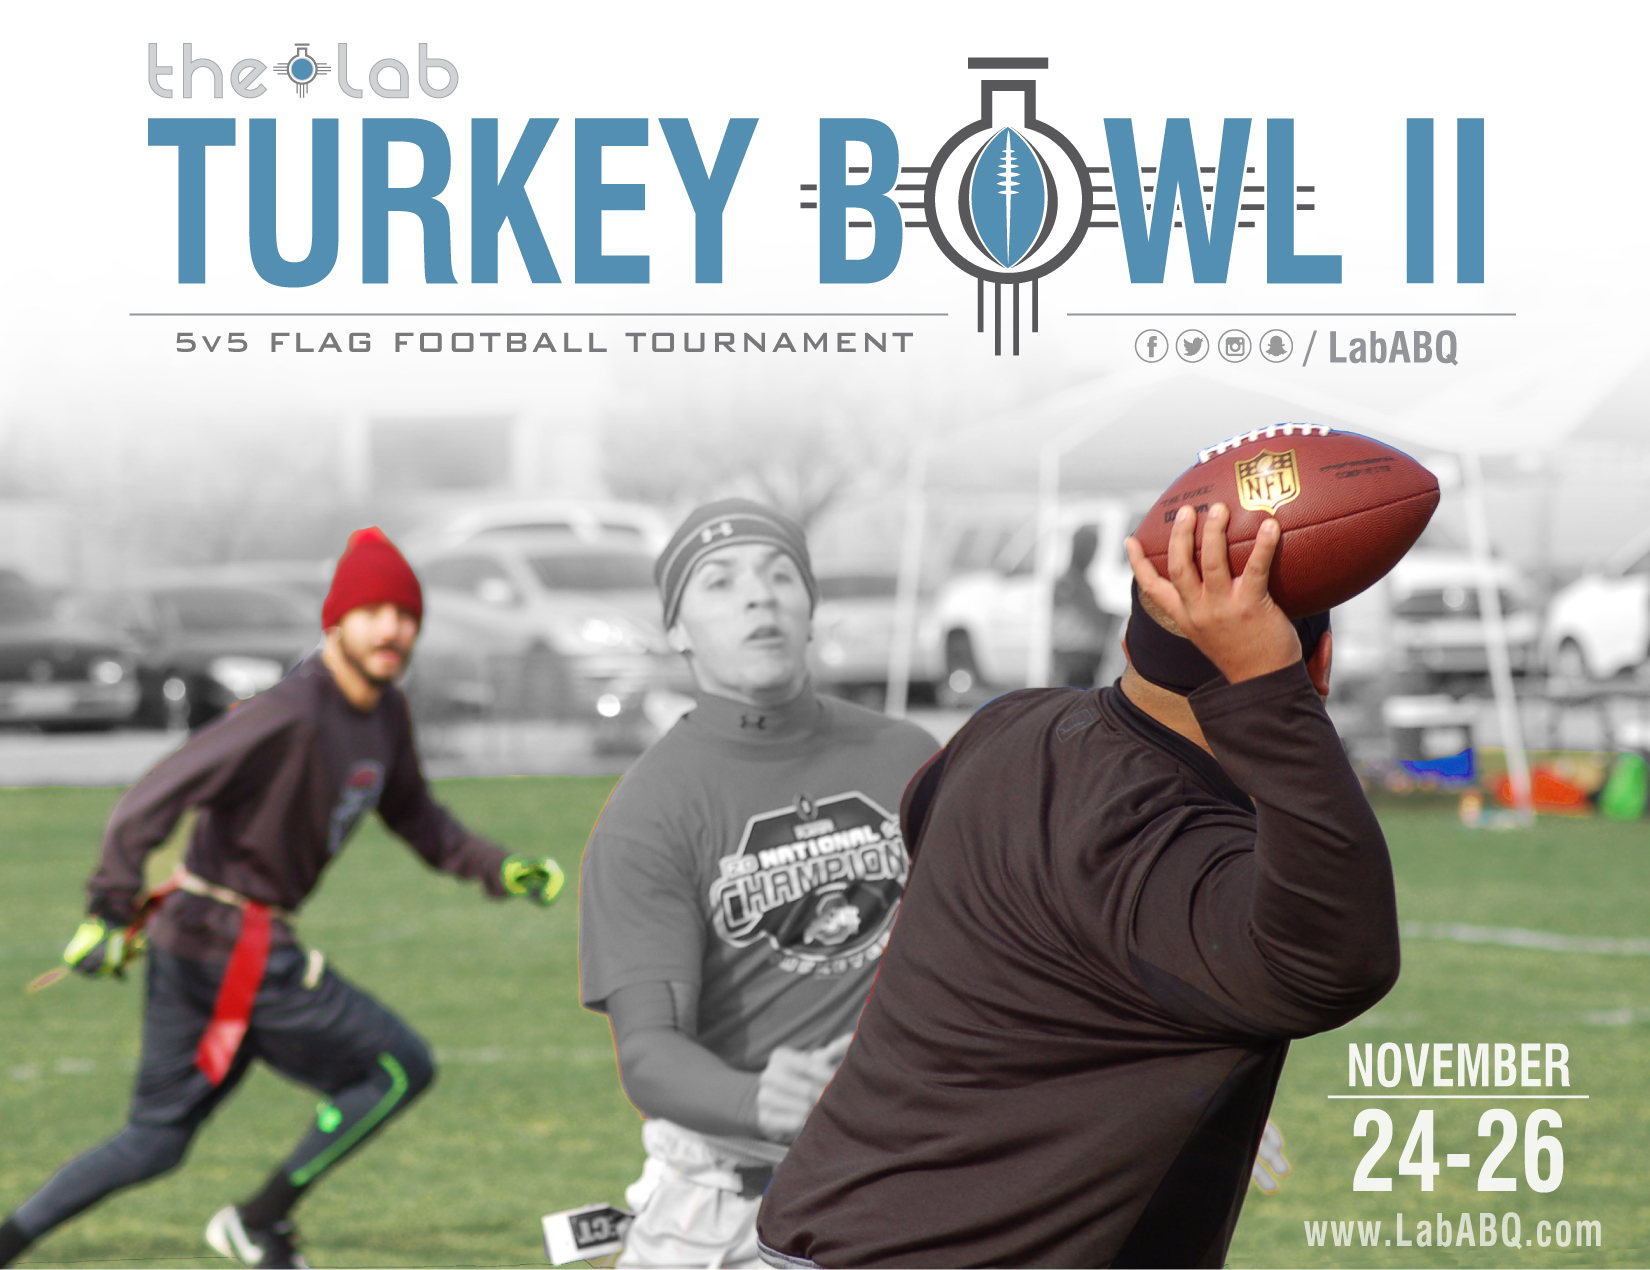 TurkeyBowl2-Promo1-BubbaJ.jpg